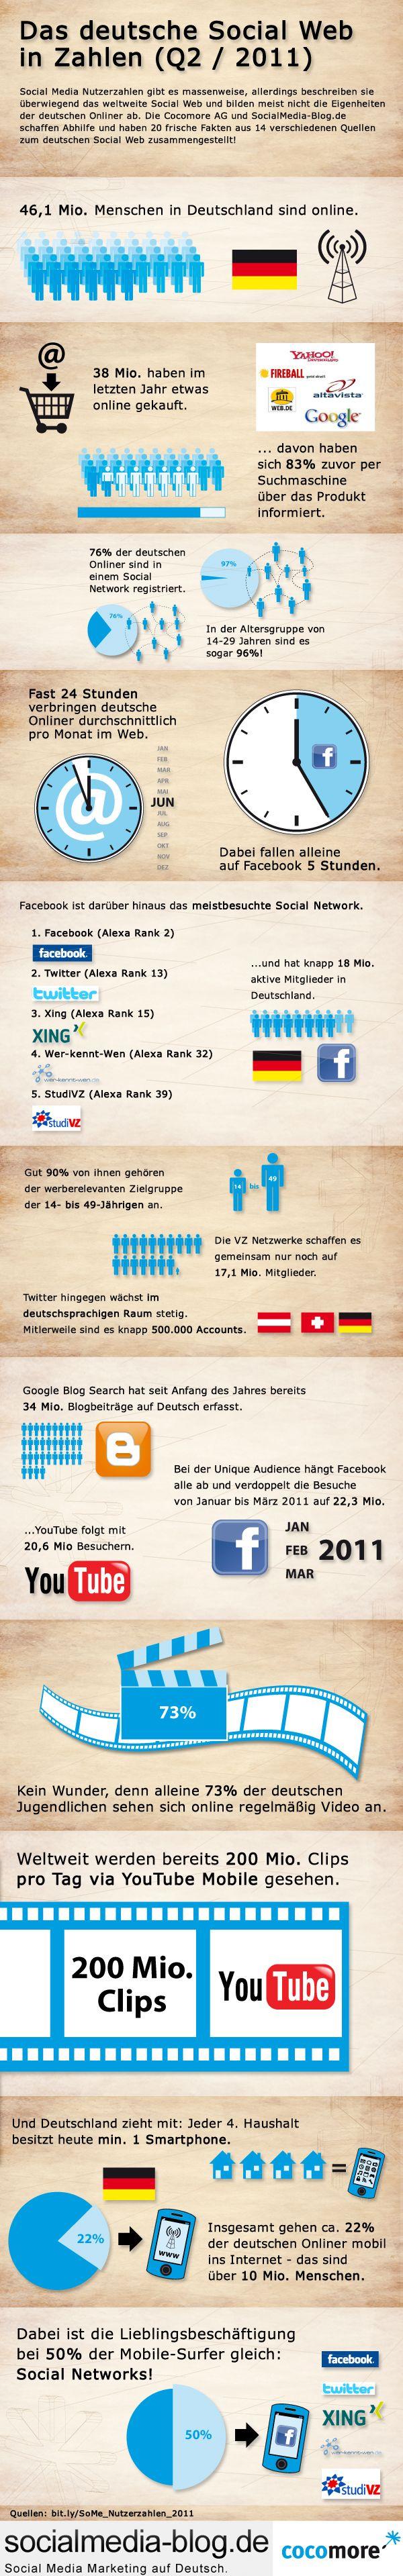 Social Media in Deutschland     #seo #youtube #marketing #pinterest #branding #howtomakemoney #top10 #facebook #germany